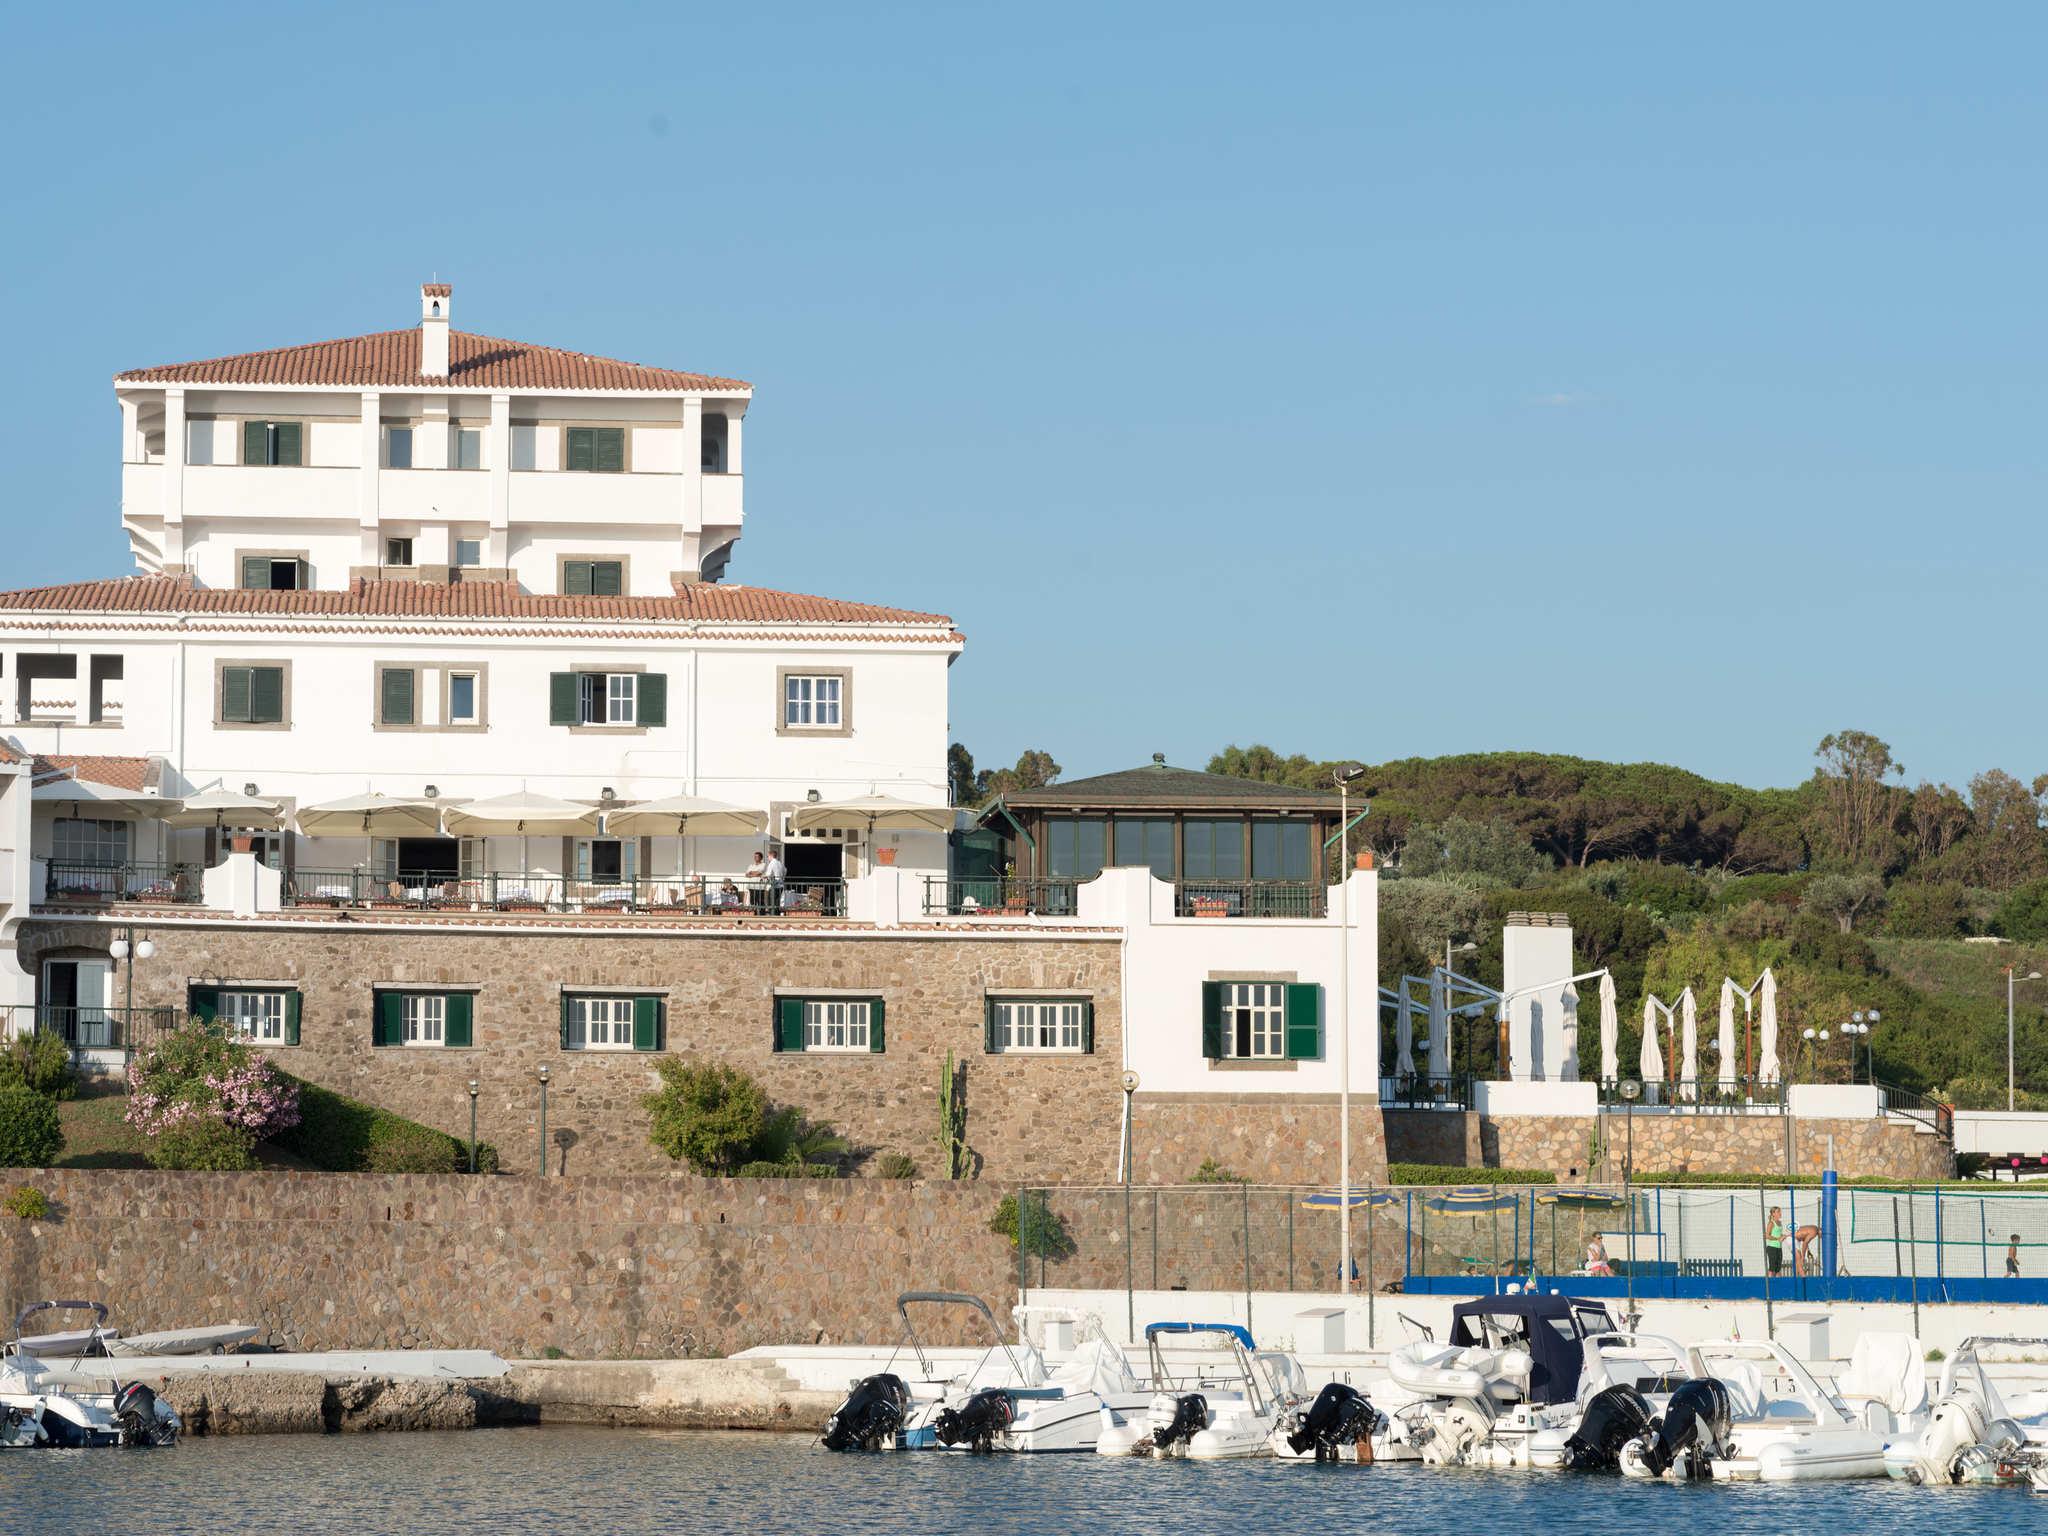 Hôtel - Mercure Civitavecchia Sunbay Park Hotel - New Opening